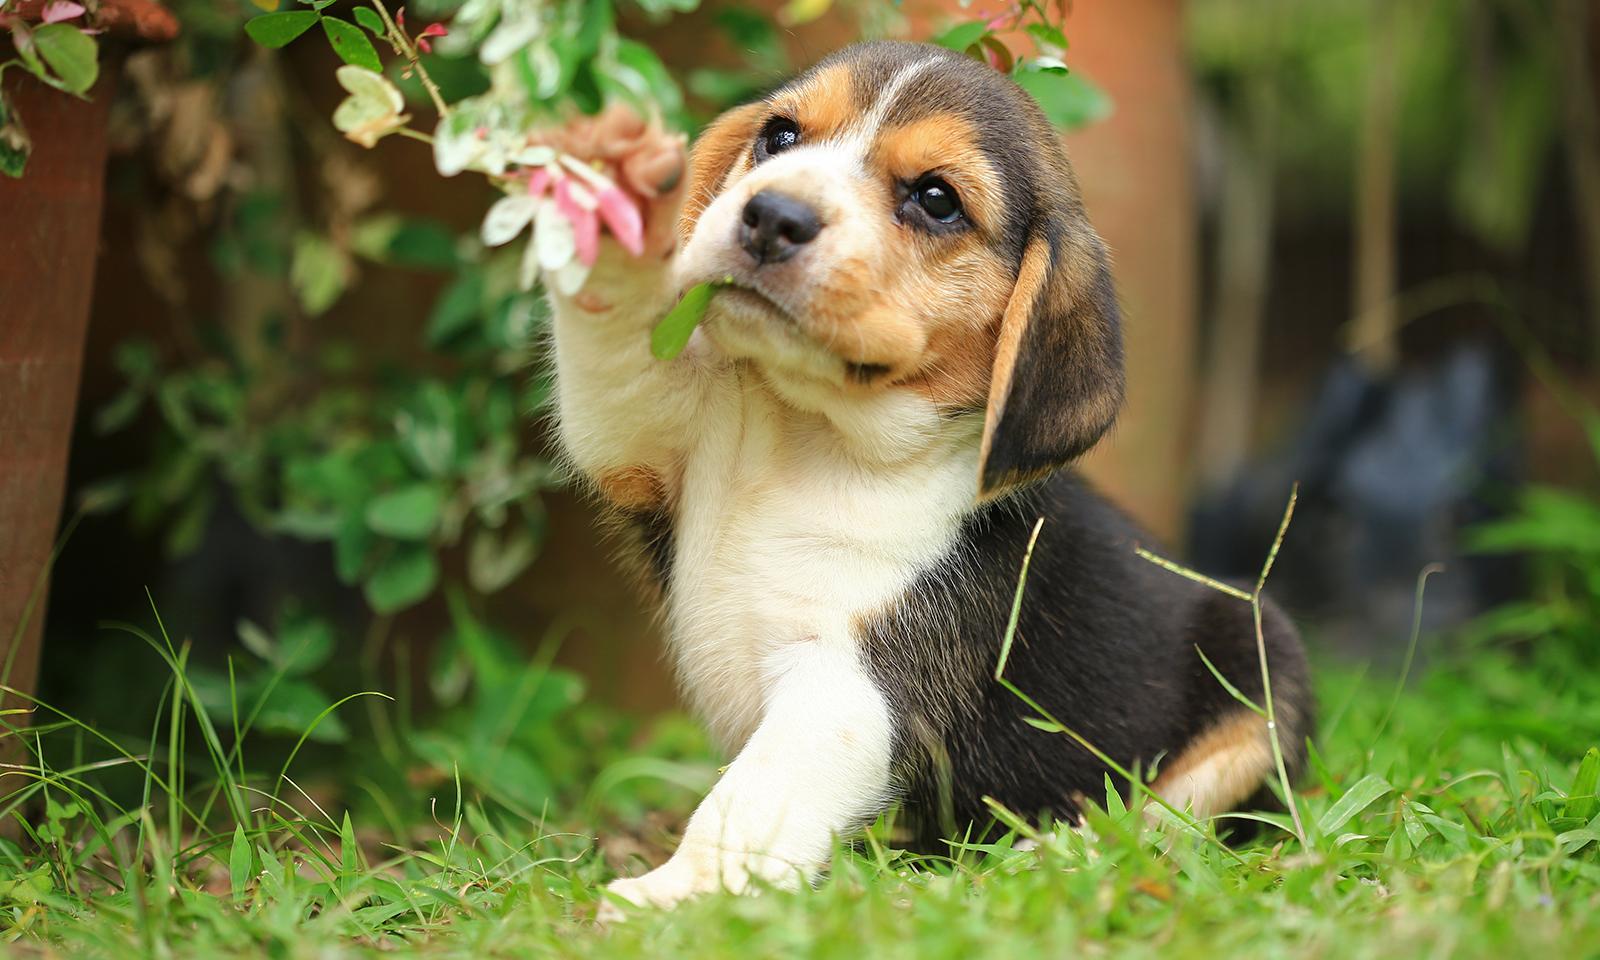 healthy-oils-to-add-to-your-dogs-diet-regimen-cute-puppy-sitting-in-grass